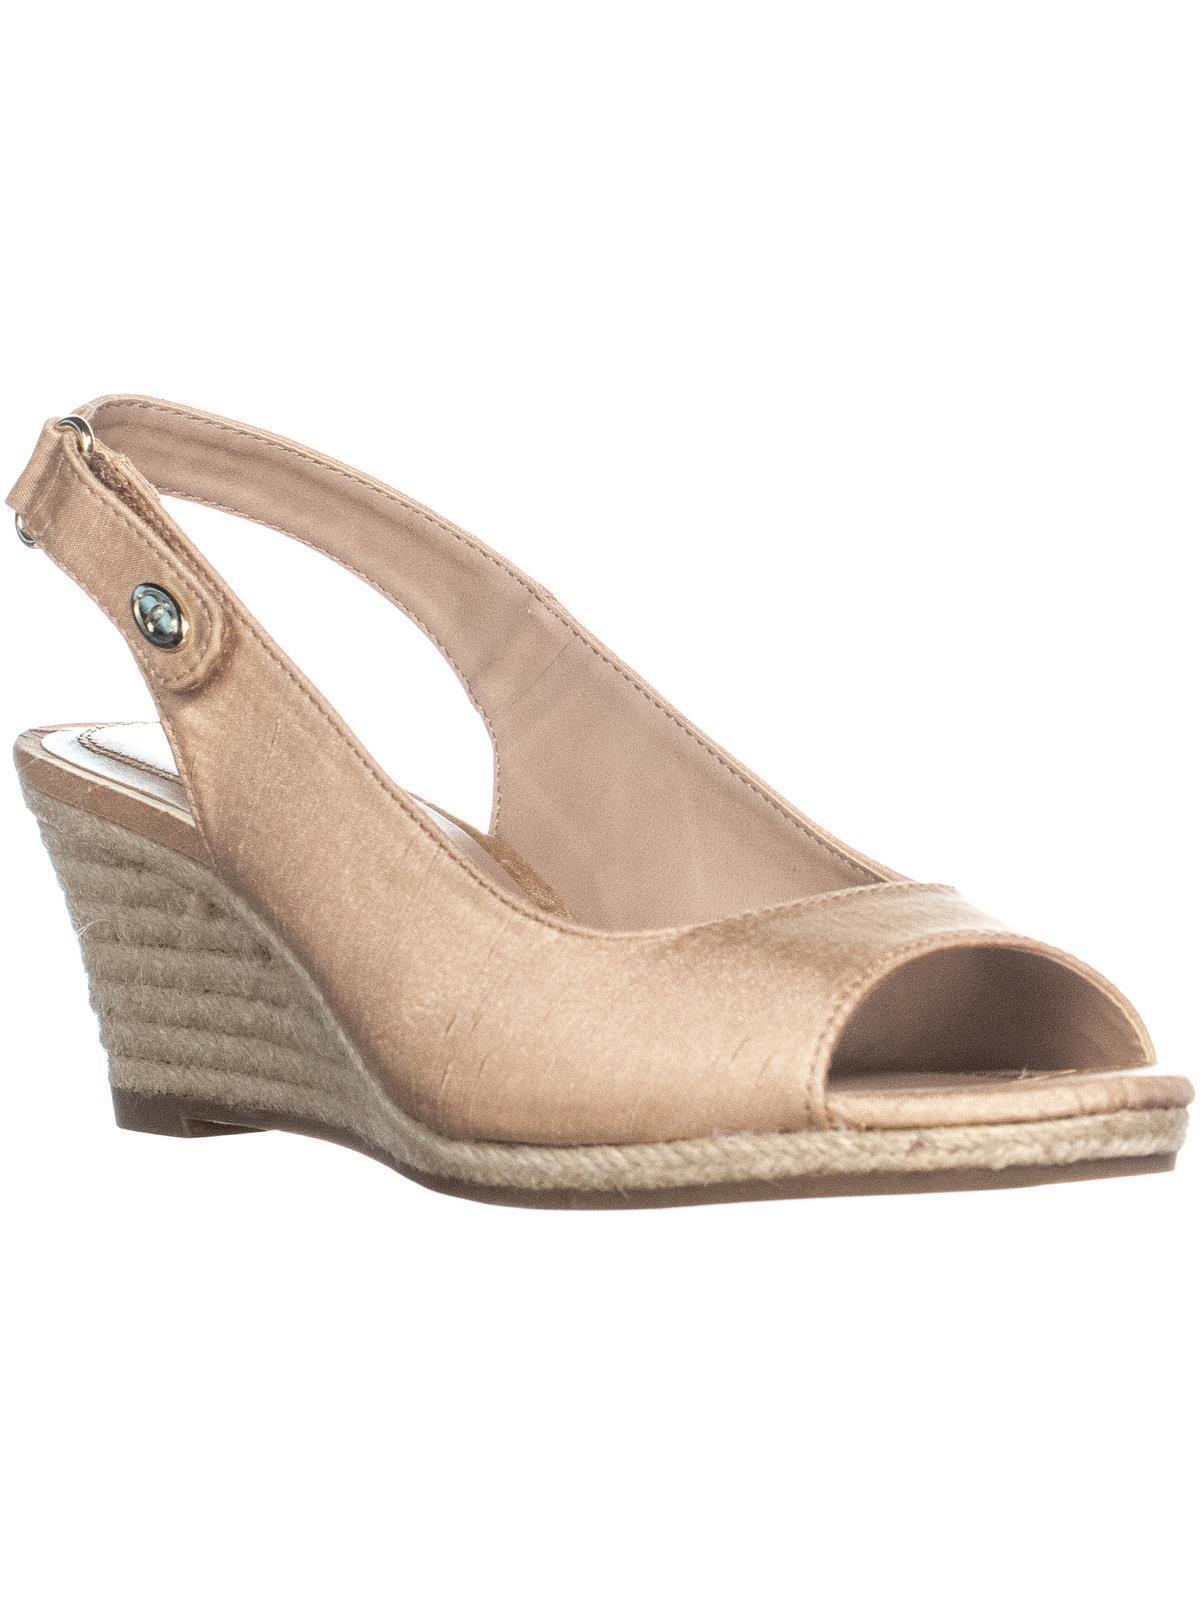 Womens CC35 Samiee Wedge Heel Espadrilles Sandals, Blush, 9 US